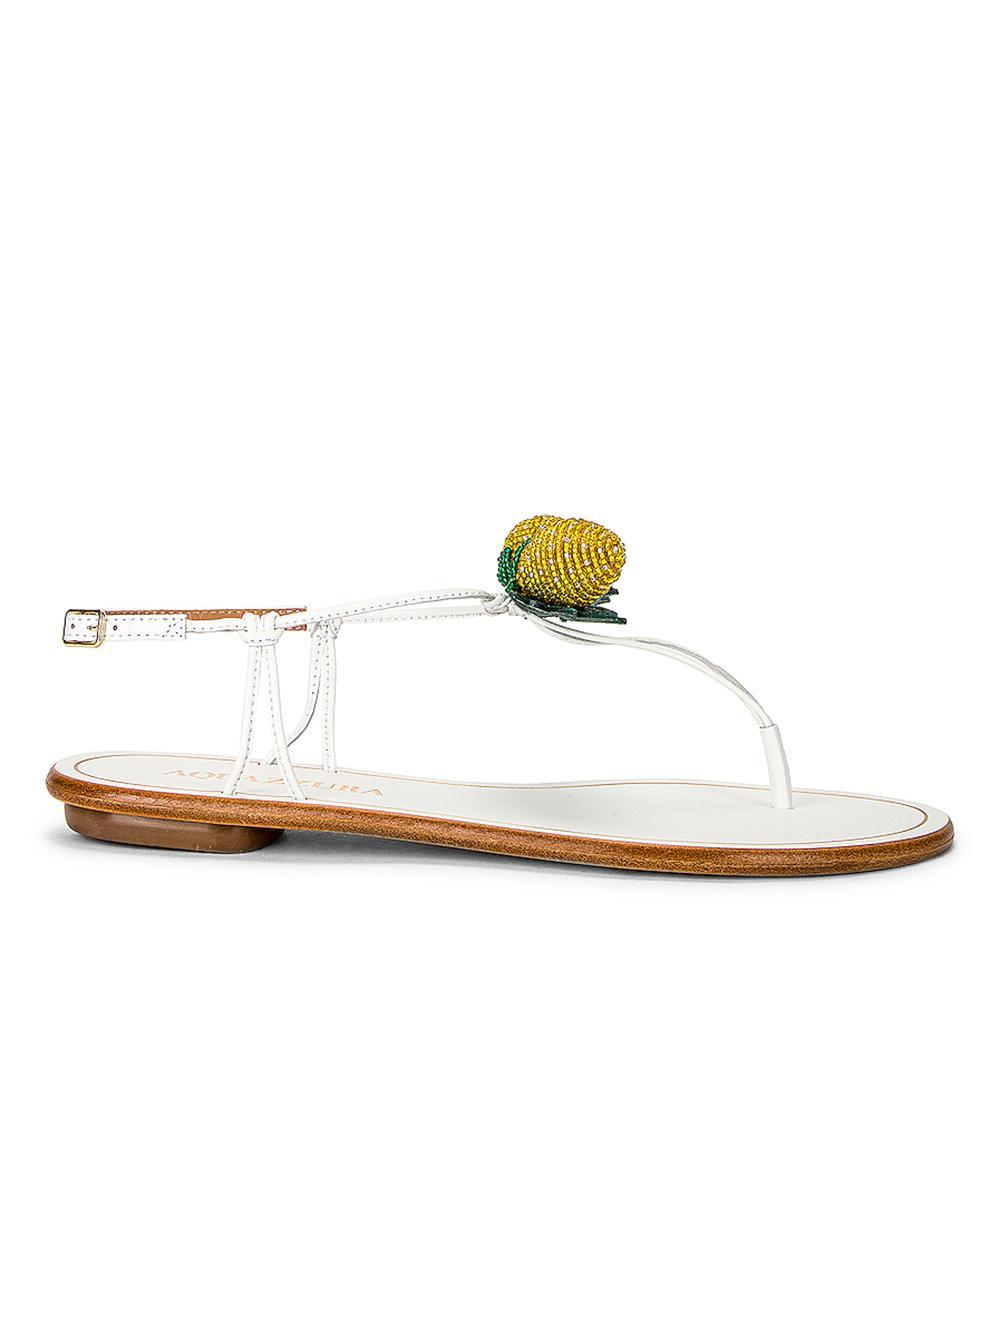 Limoncello Flat Sandal Item # LIMFLASO-NAP